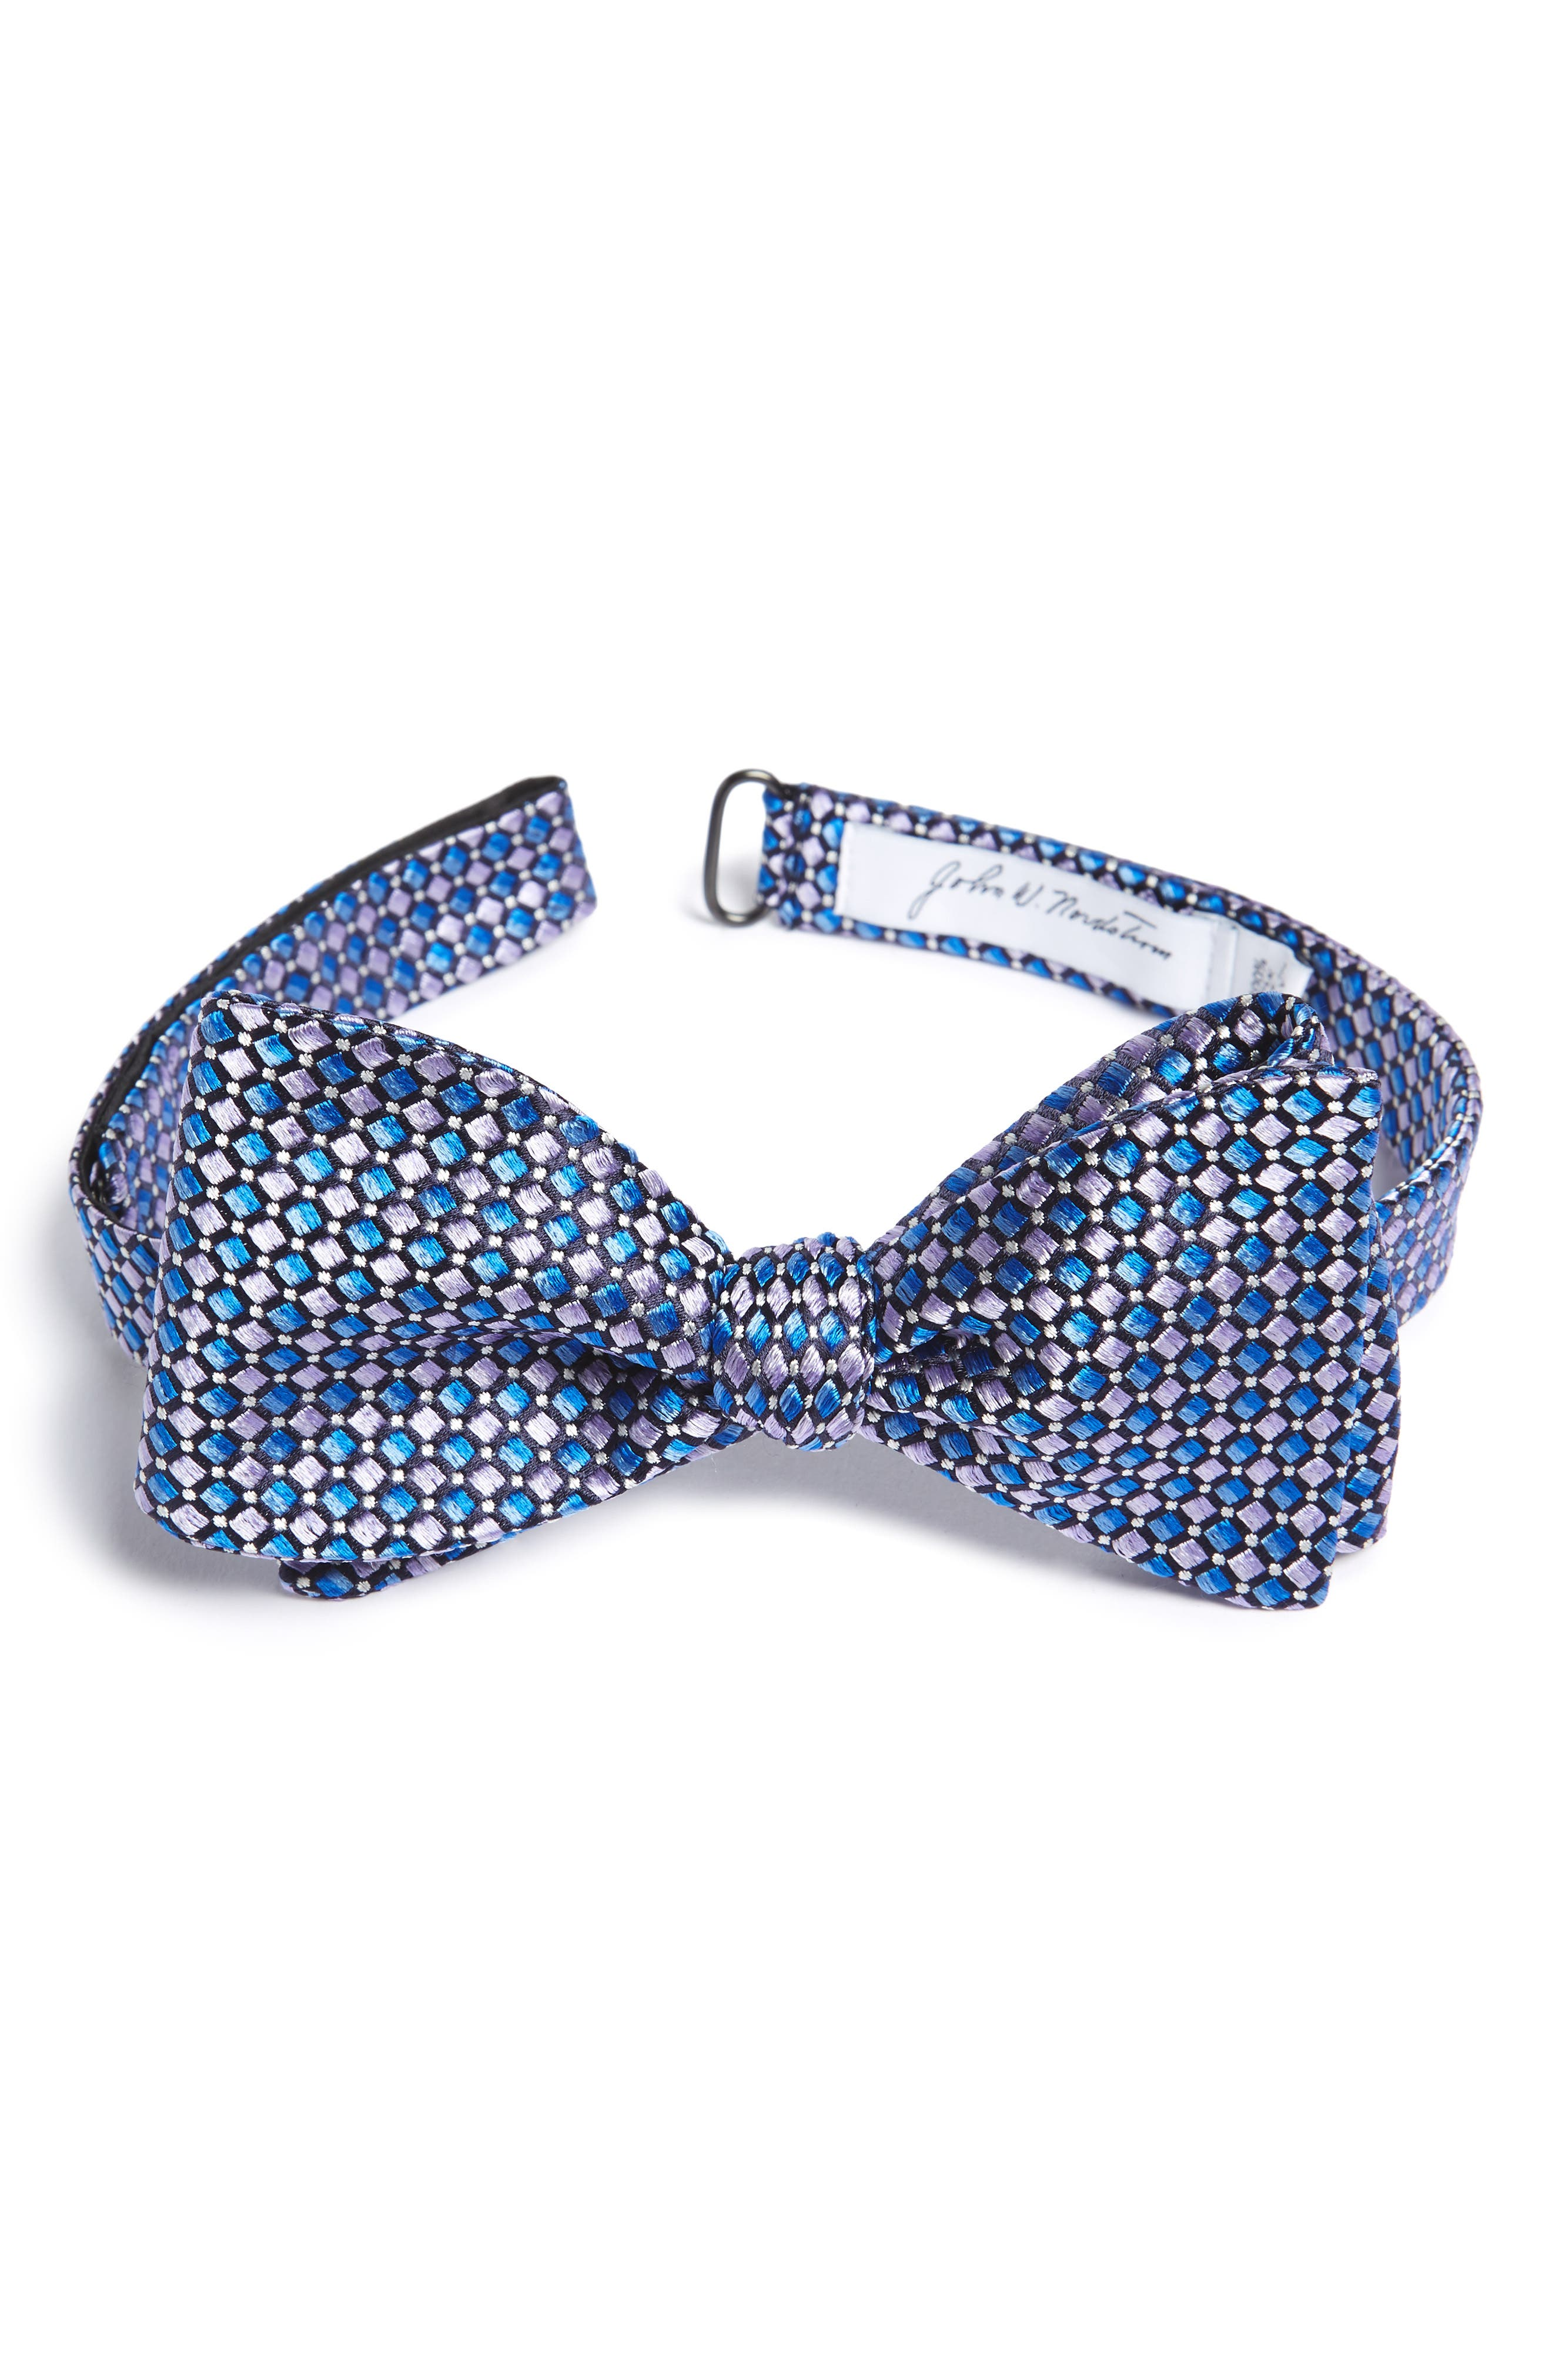 Main Image - John W. Nordstrom® Geometric Silk Bow Tie